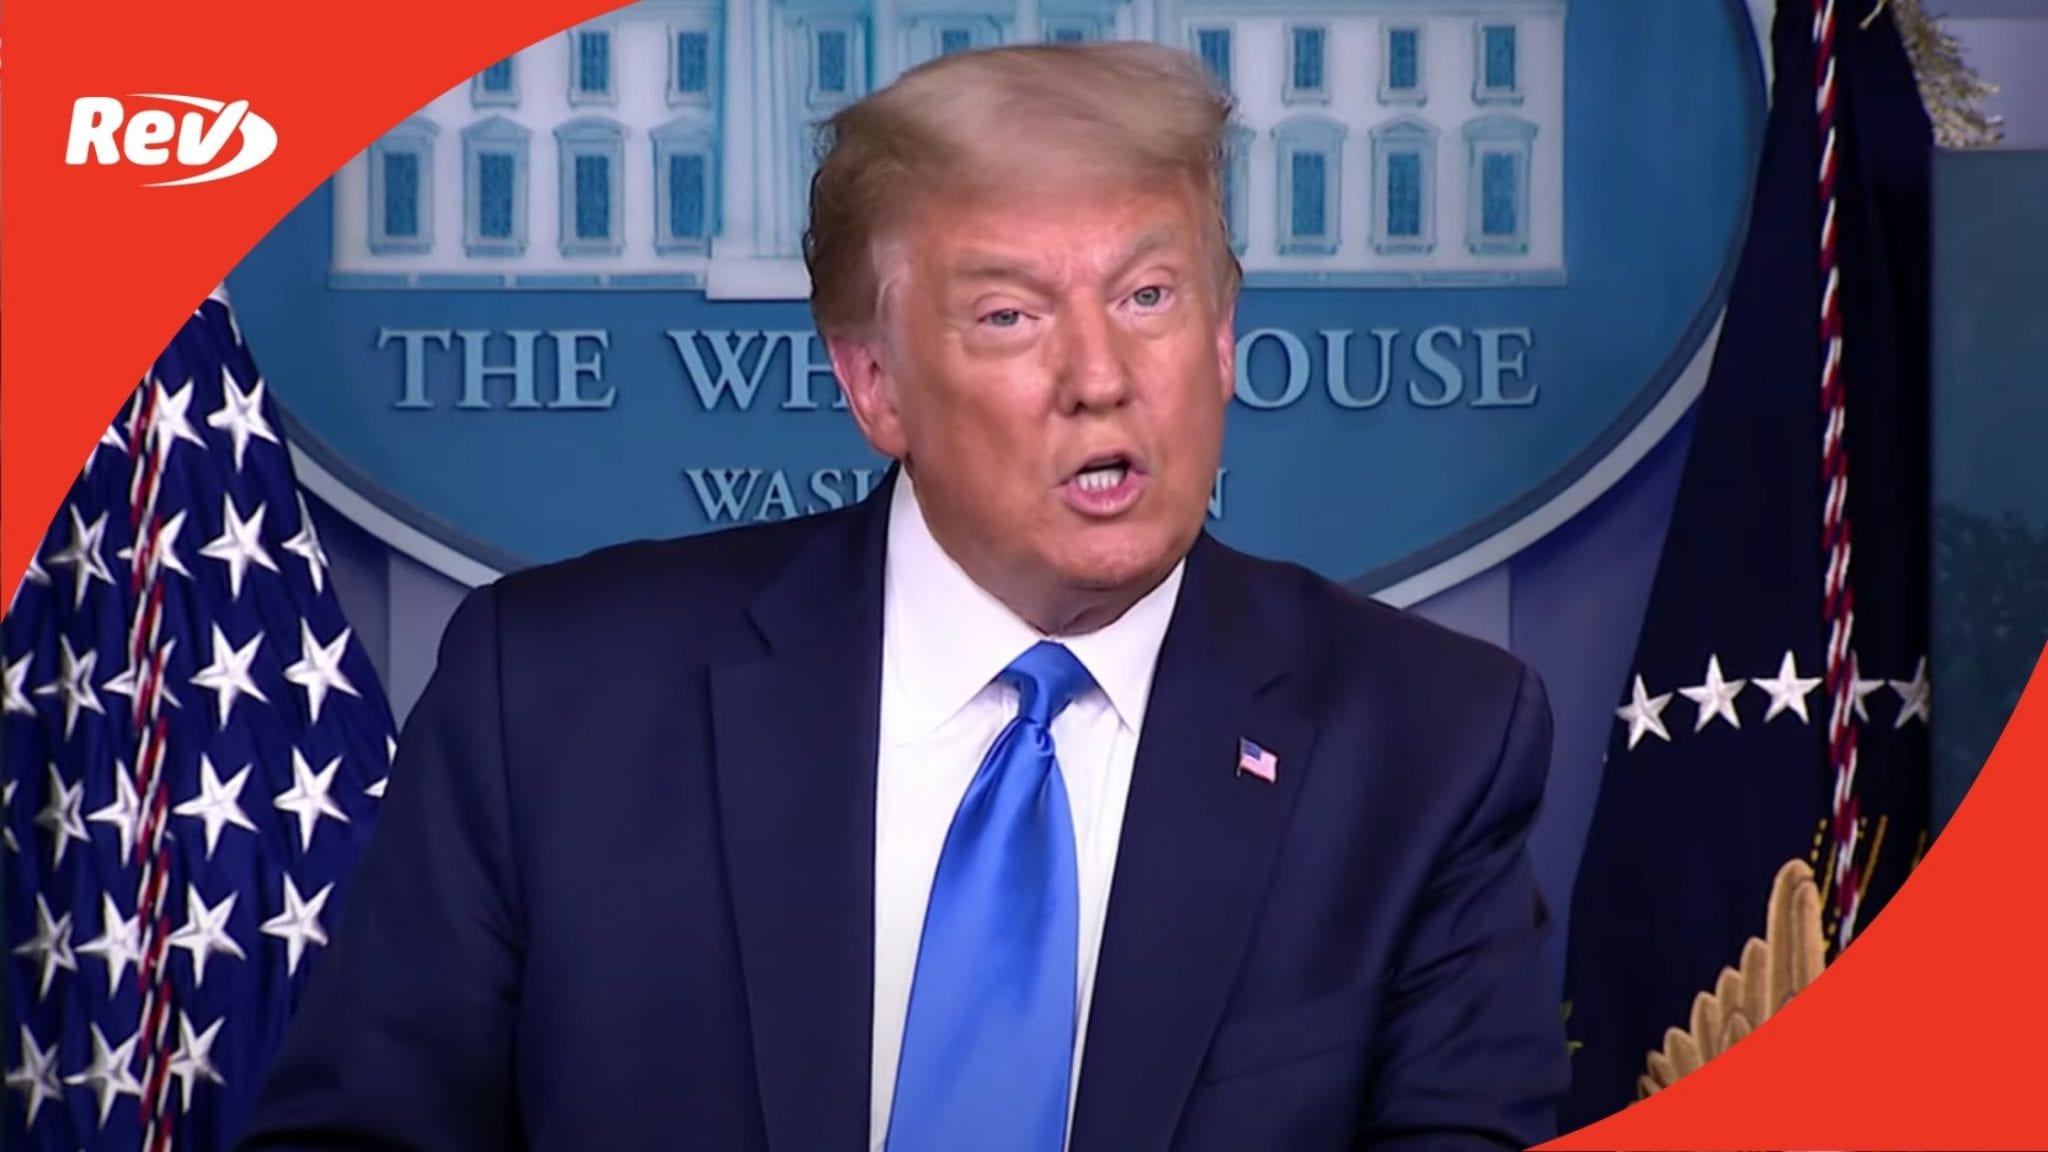 Donald Trump White House Press Briefing Transcript September 23